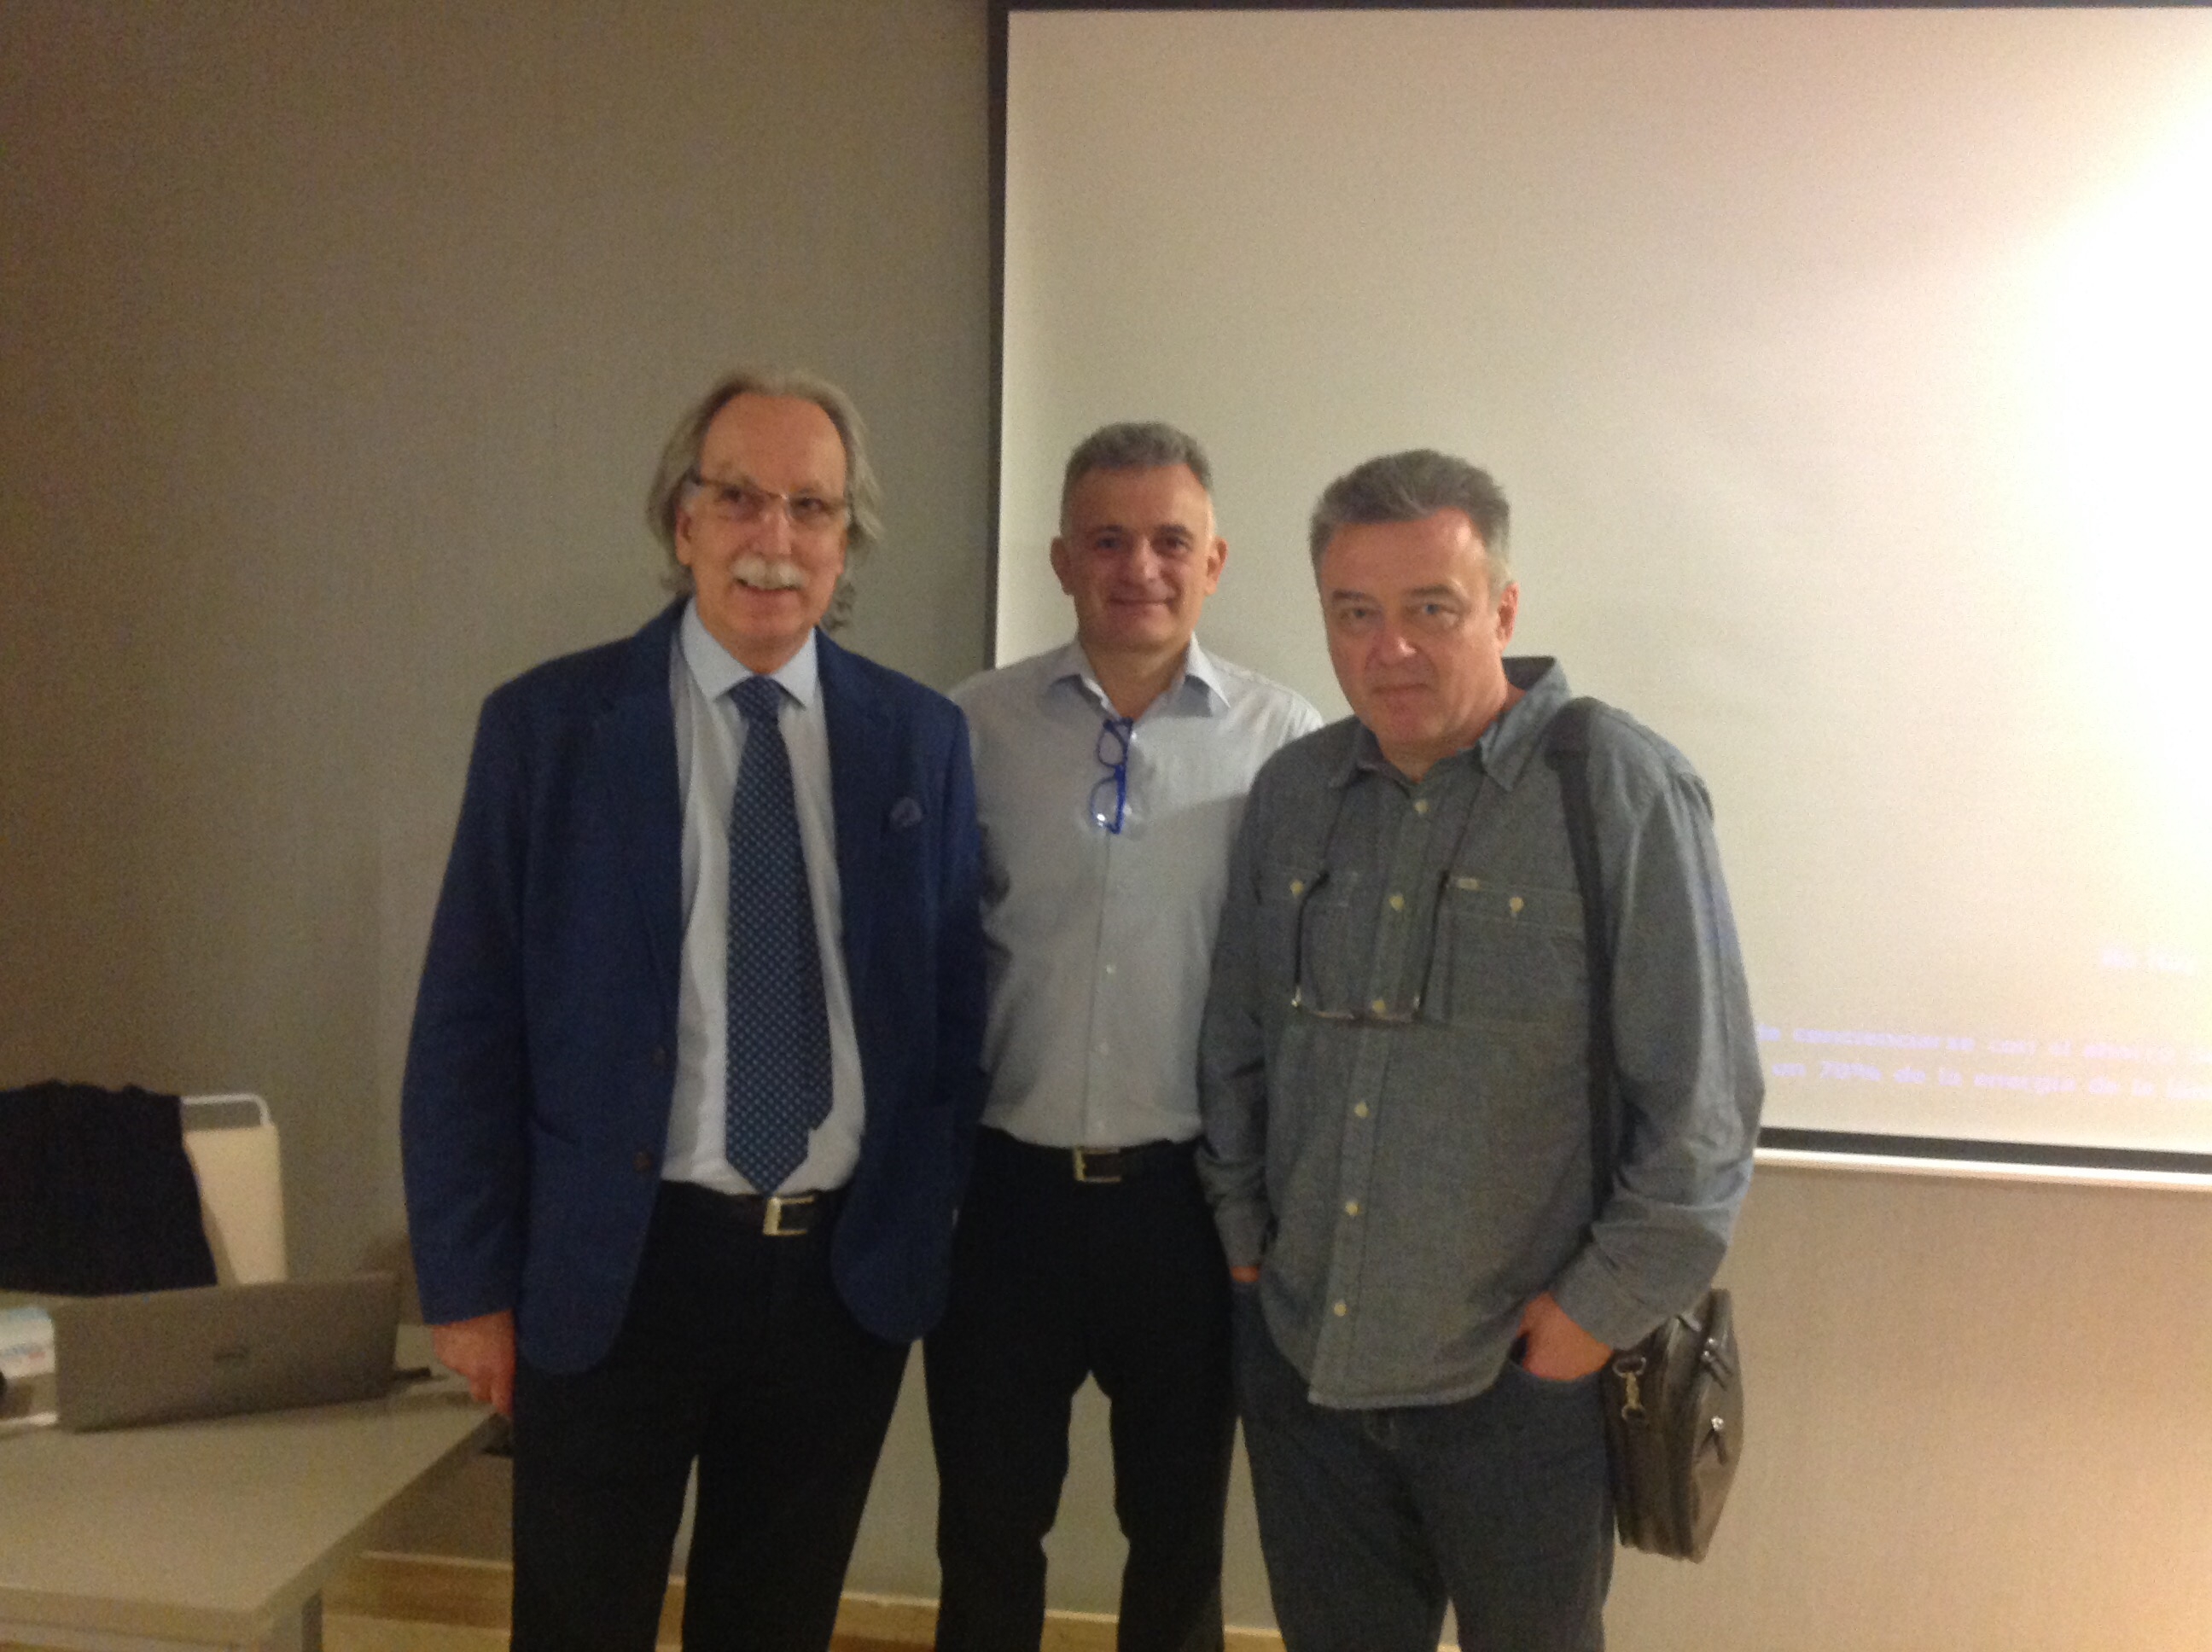 Curso Dr.VITOMIR S.KONSTANTINOVIC. STRATEGIC IMPLANTS® con DR REY, Implantes en Madrid.